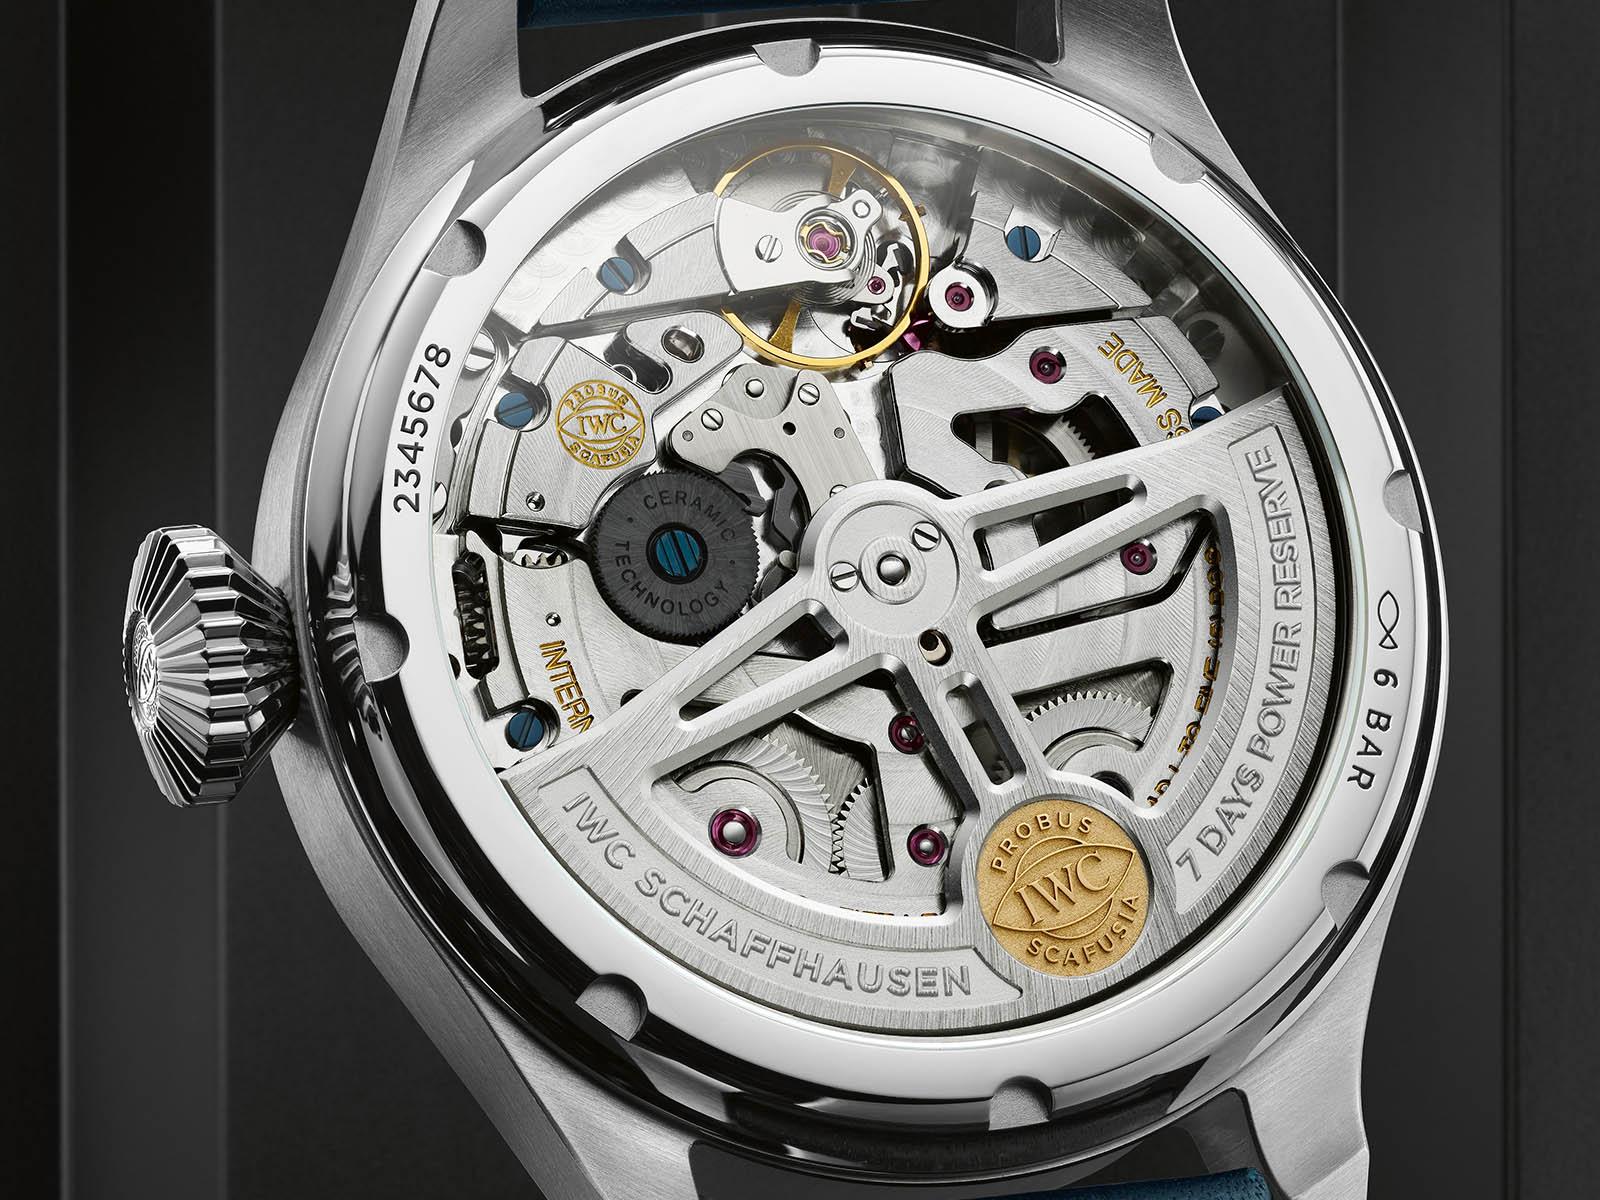 iw503605-iwc-big-pilot-s-watch-perpetual-calendar-5.jpg